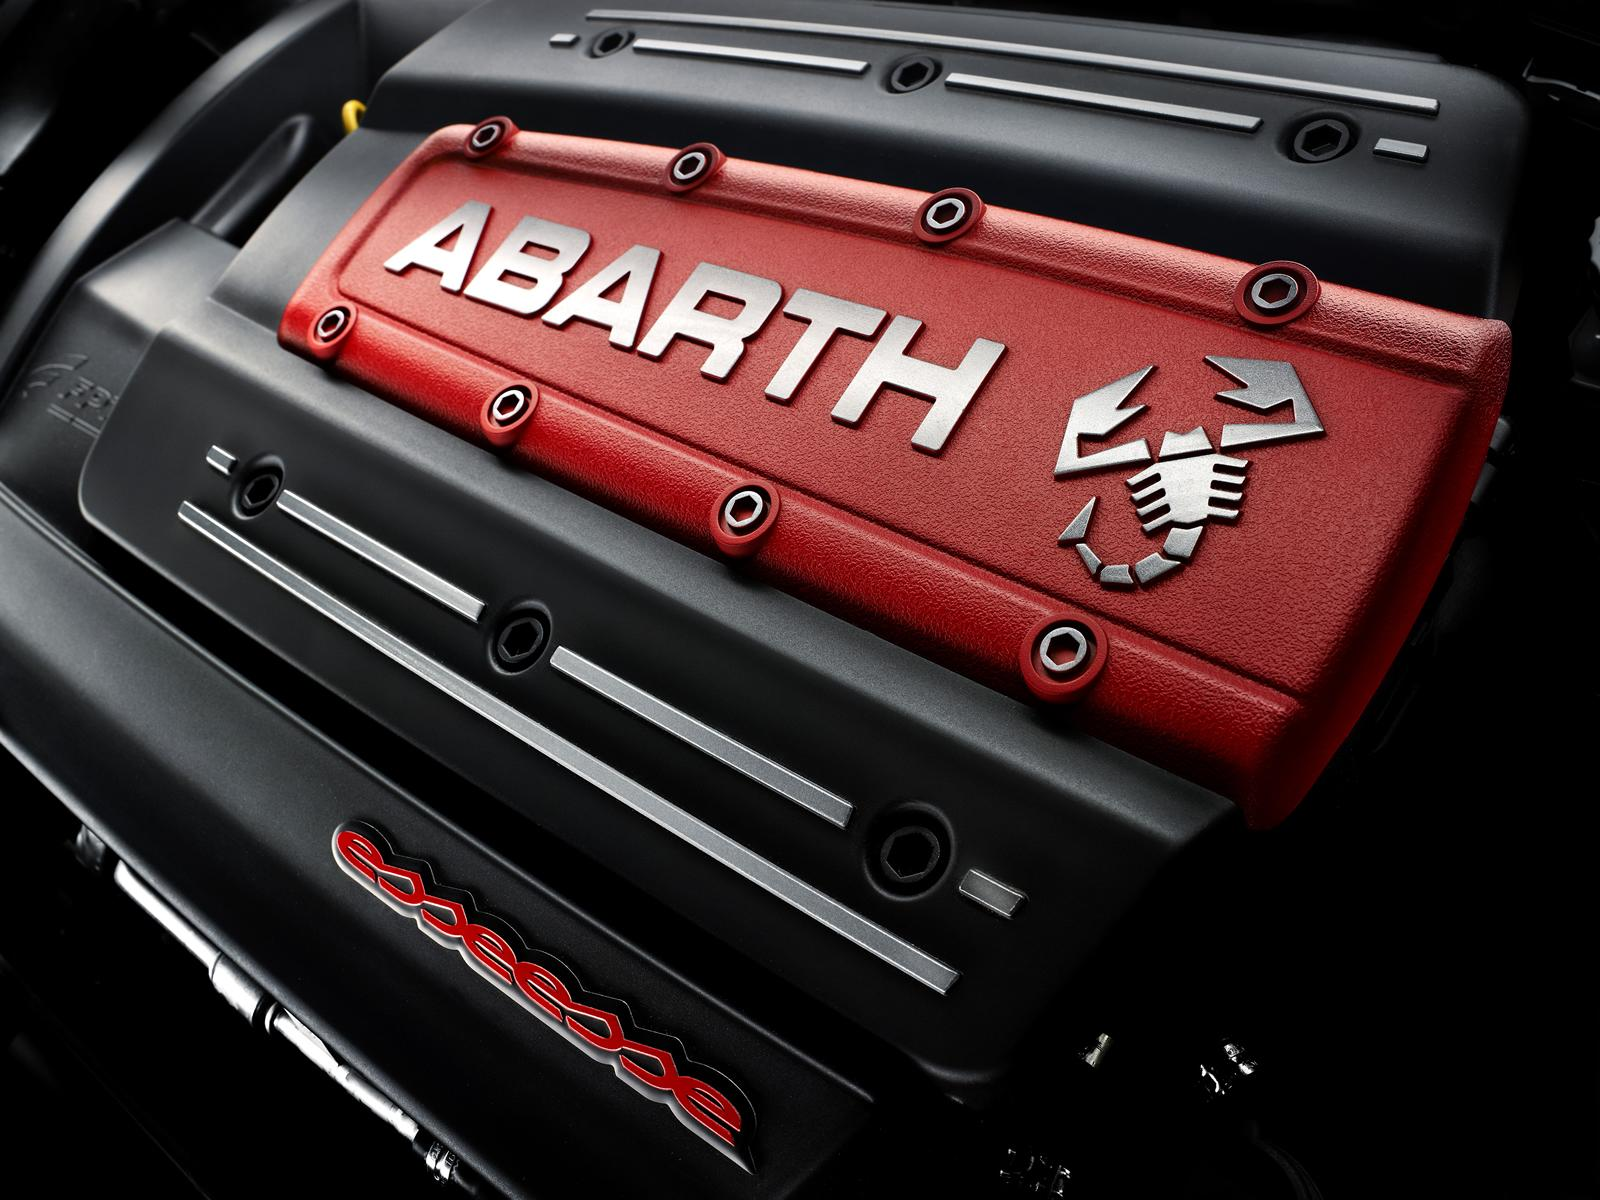 13 best Abarth GTClic Car images on Pinterest   Fiat abarth ...